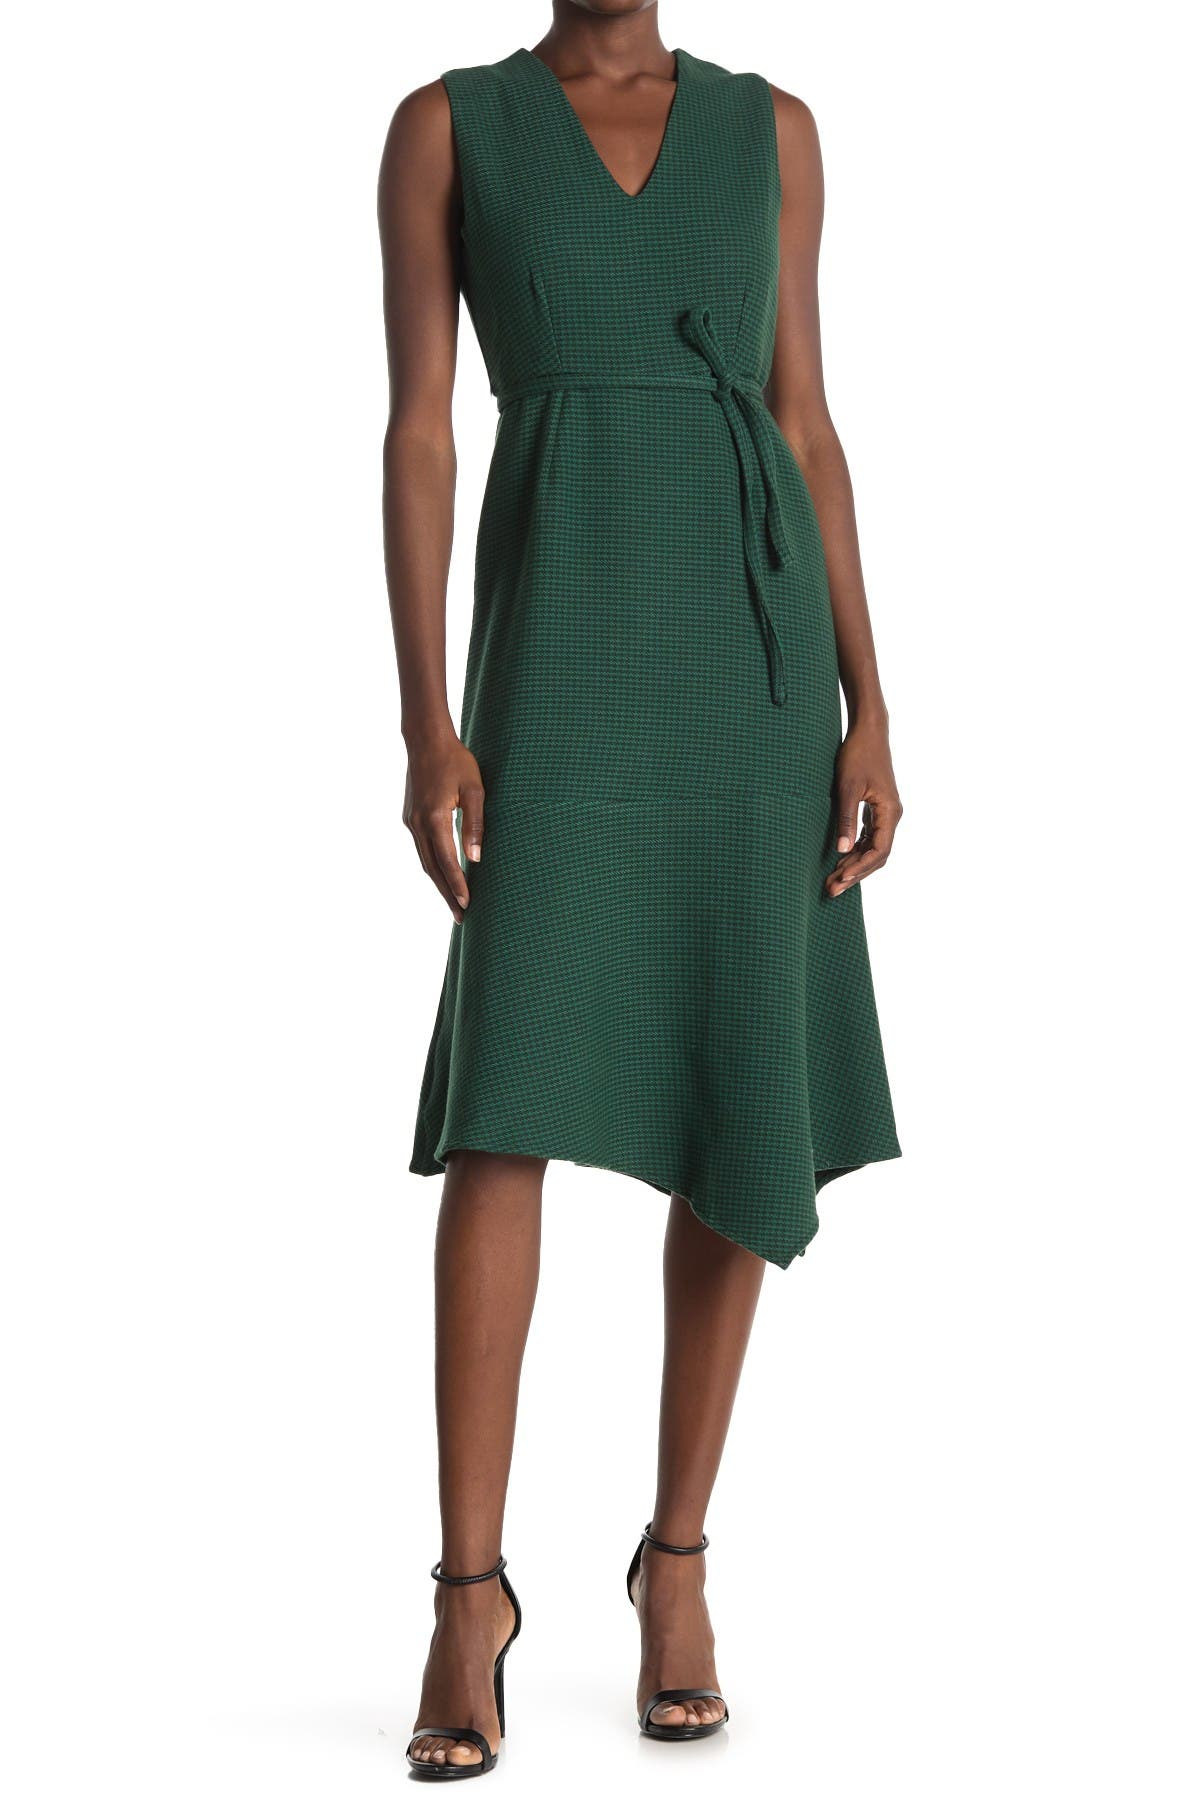 Image of Maisie Bennett Houndstooth Sleeveless Midi Dress